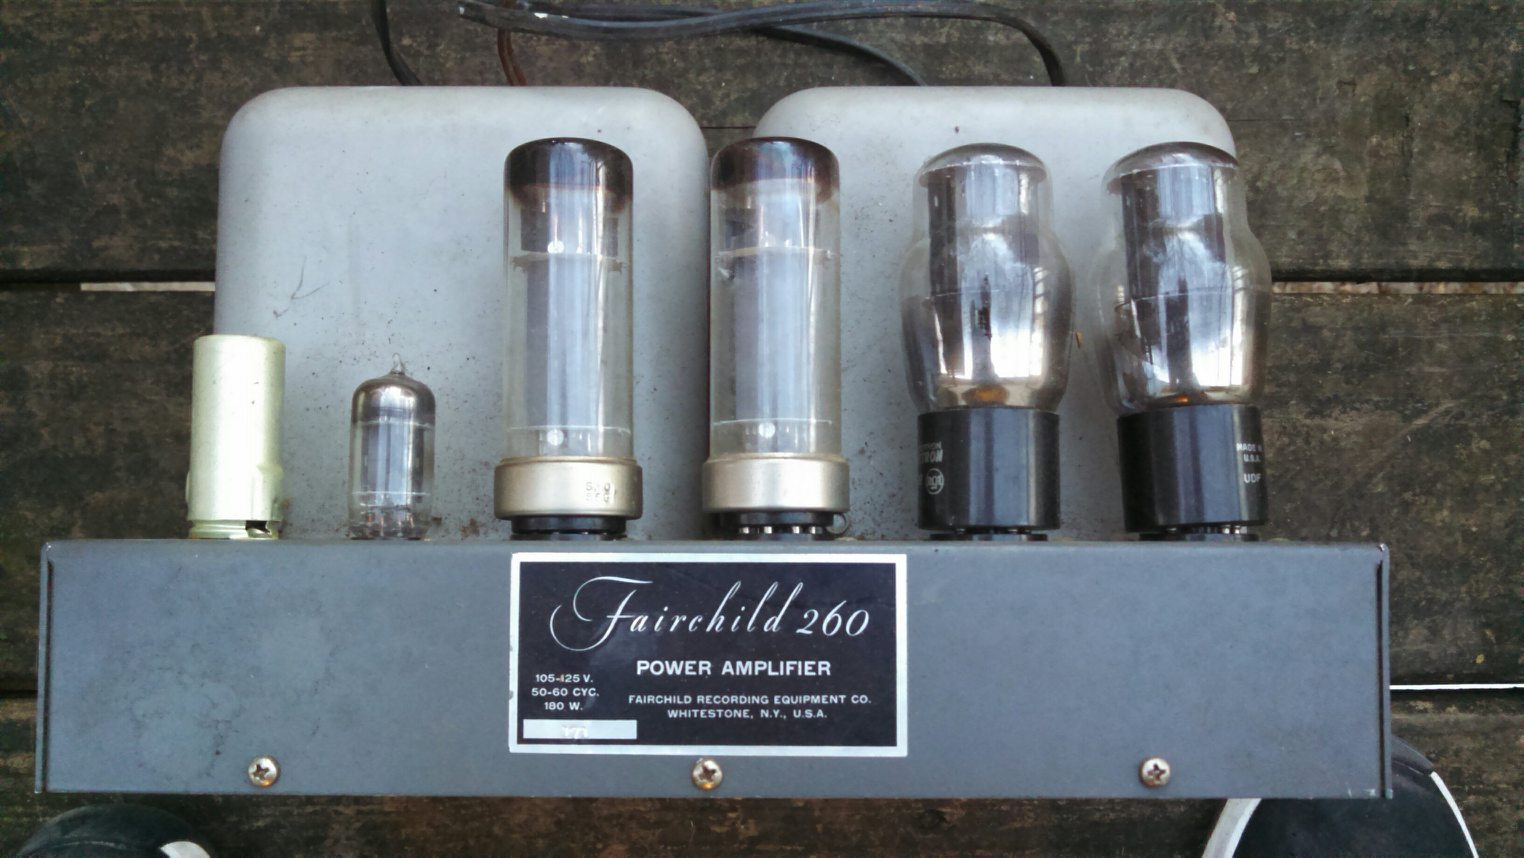 fairchild 260 talkin tubes the klipsch audio community